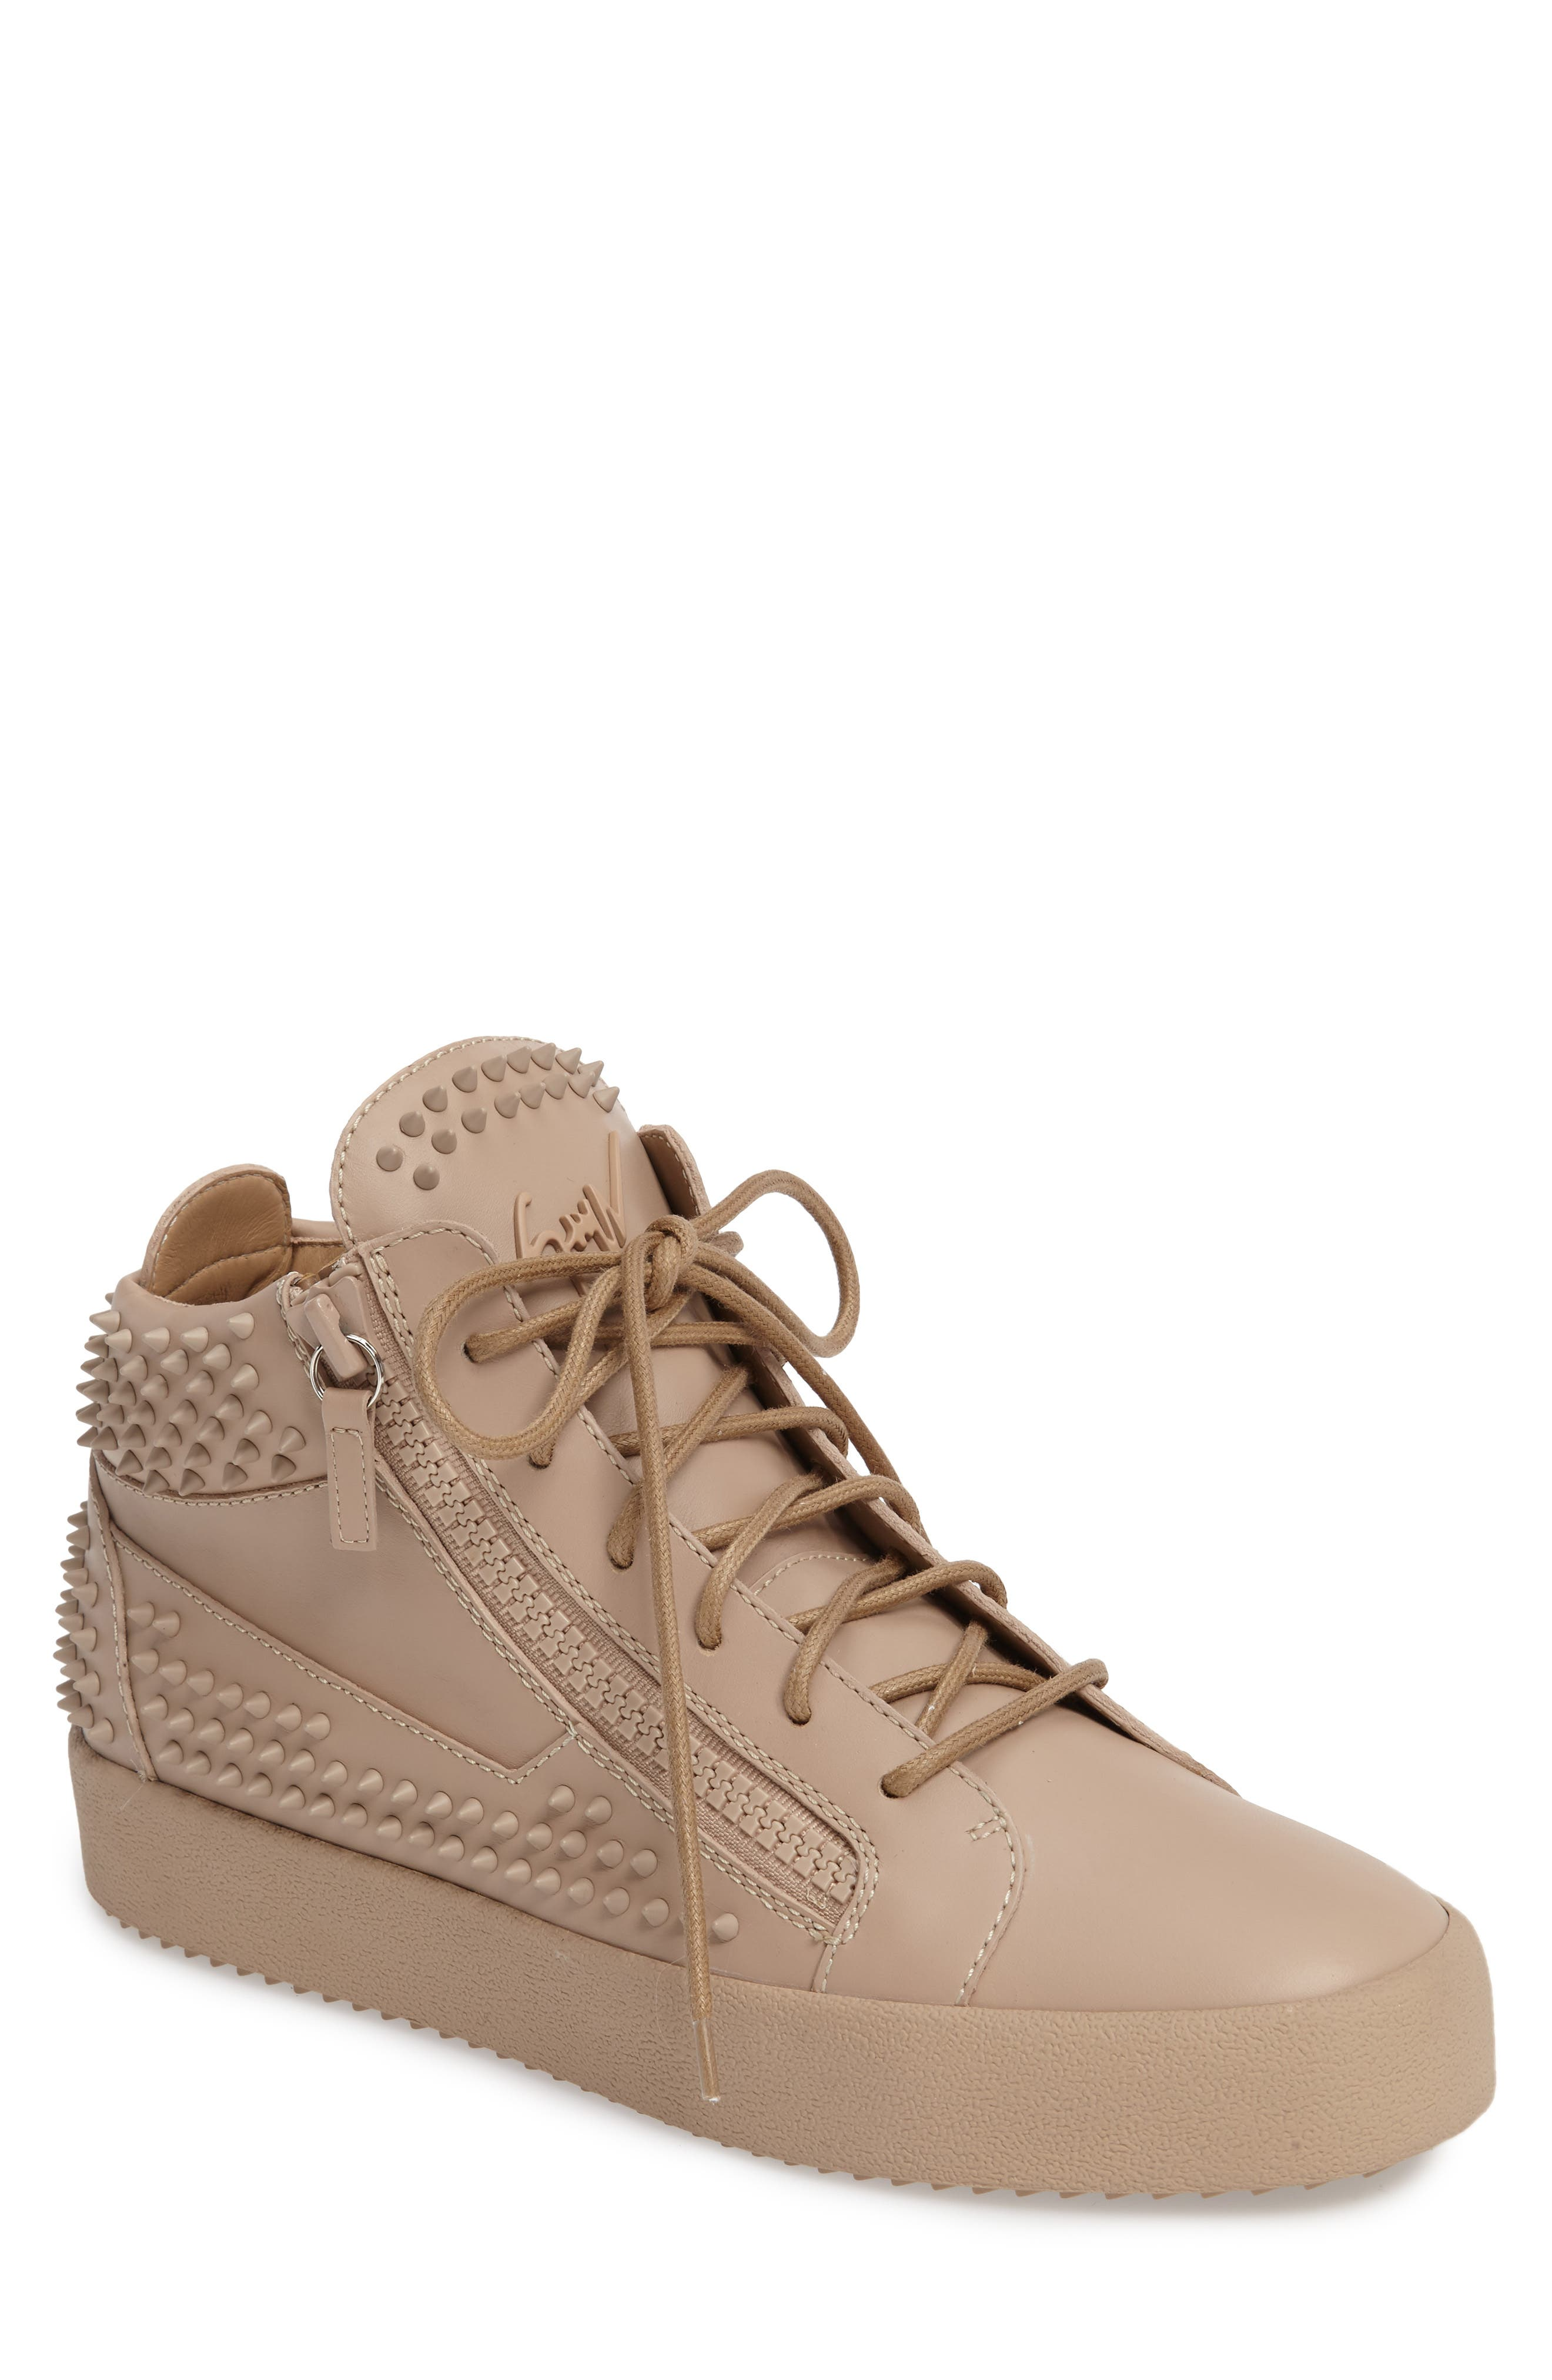 GIUSEPPE ZANOTTI Studded Mid Top Sneaker